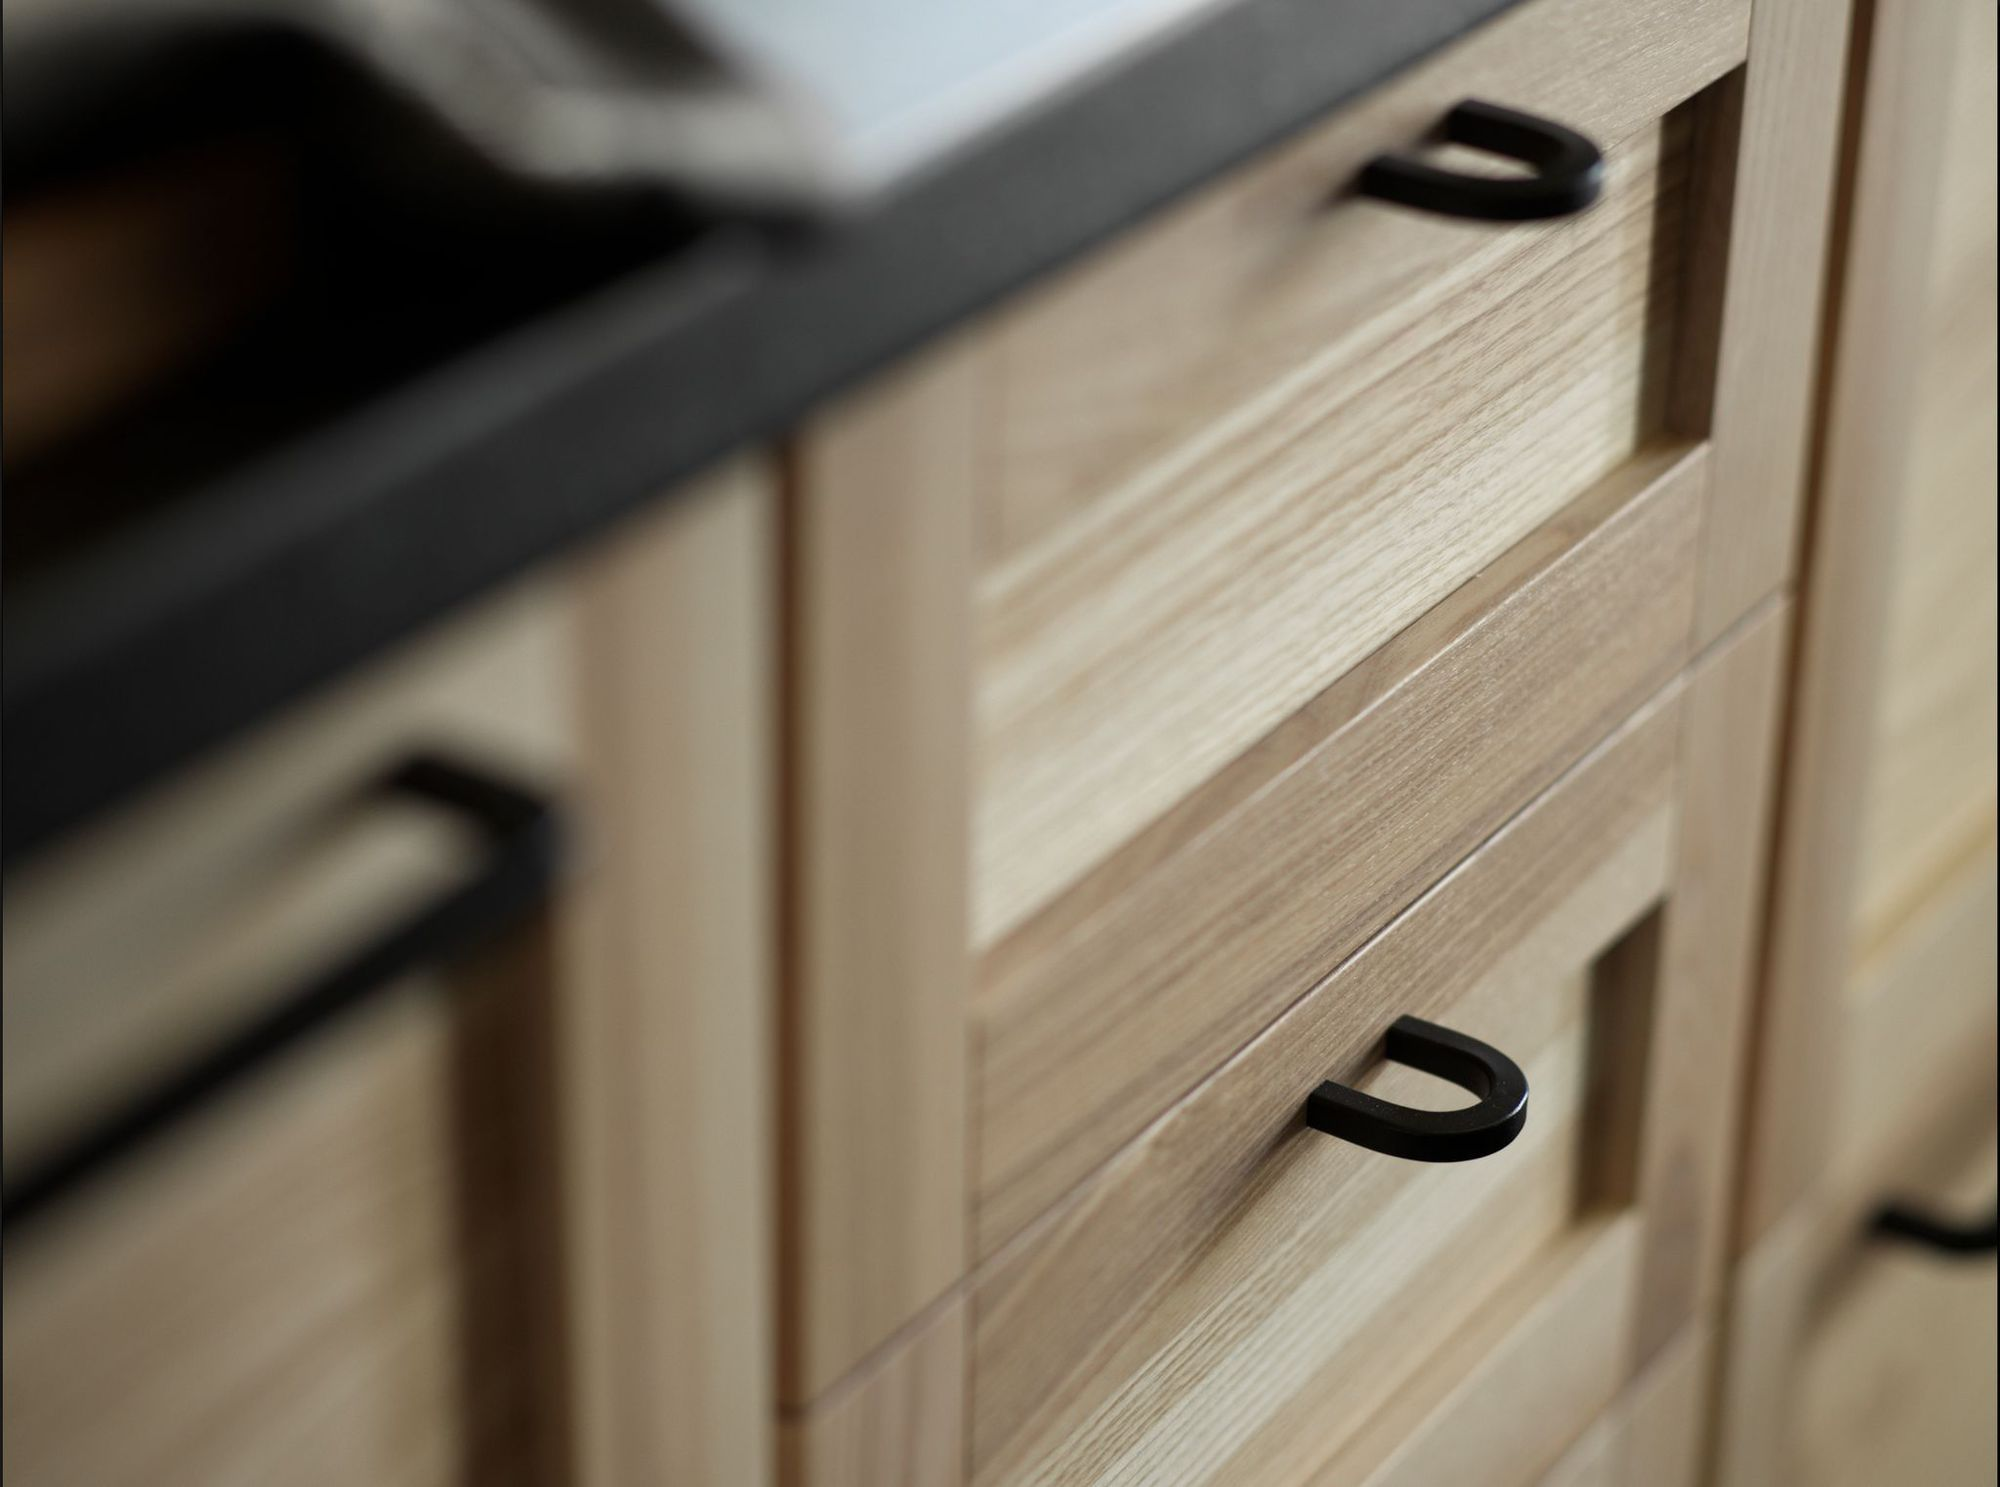 Poignée De Meuble Originale poignées de cuisine : boutons de meubles design | poignée